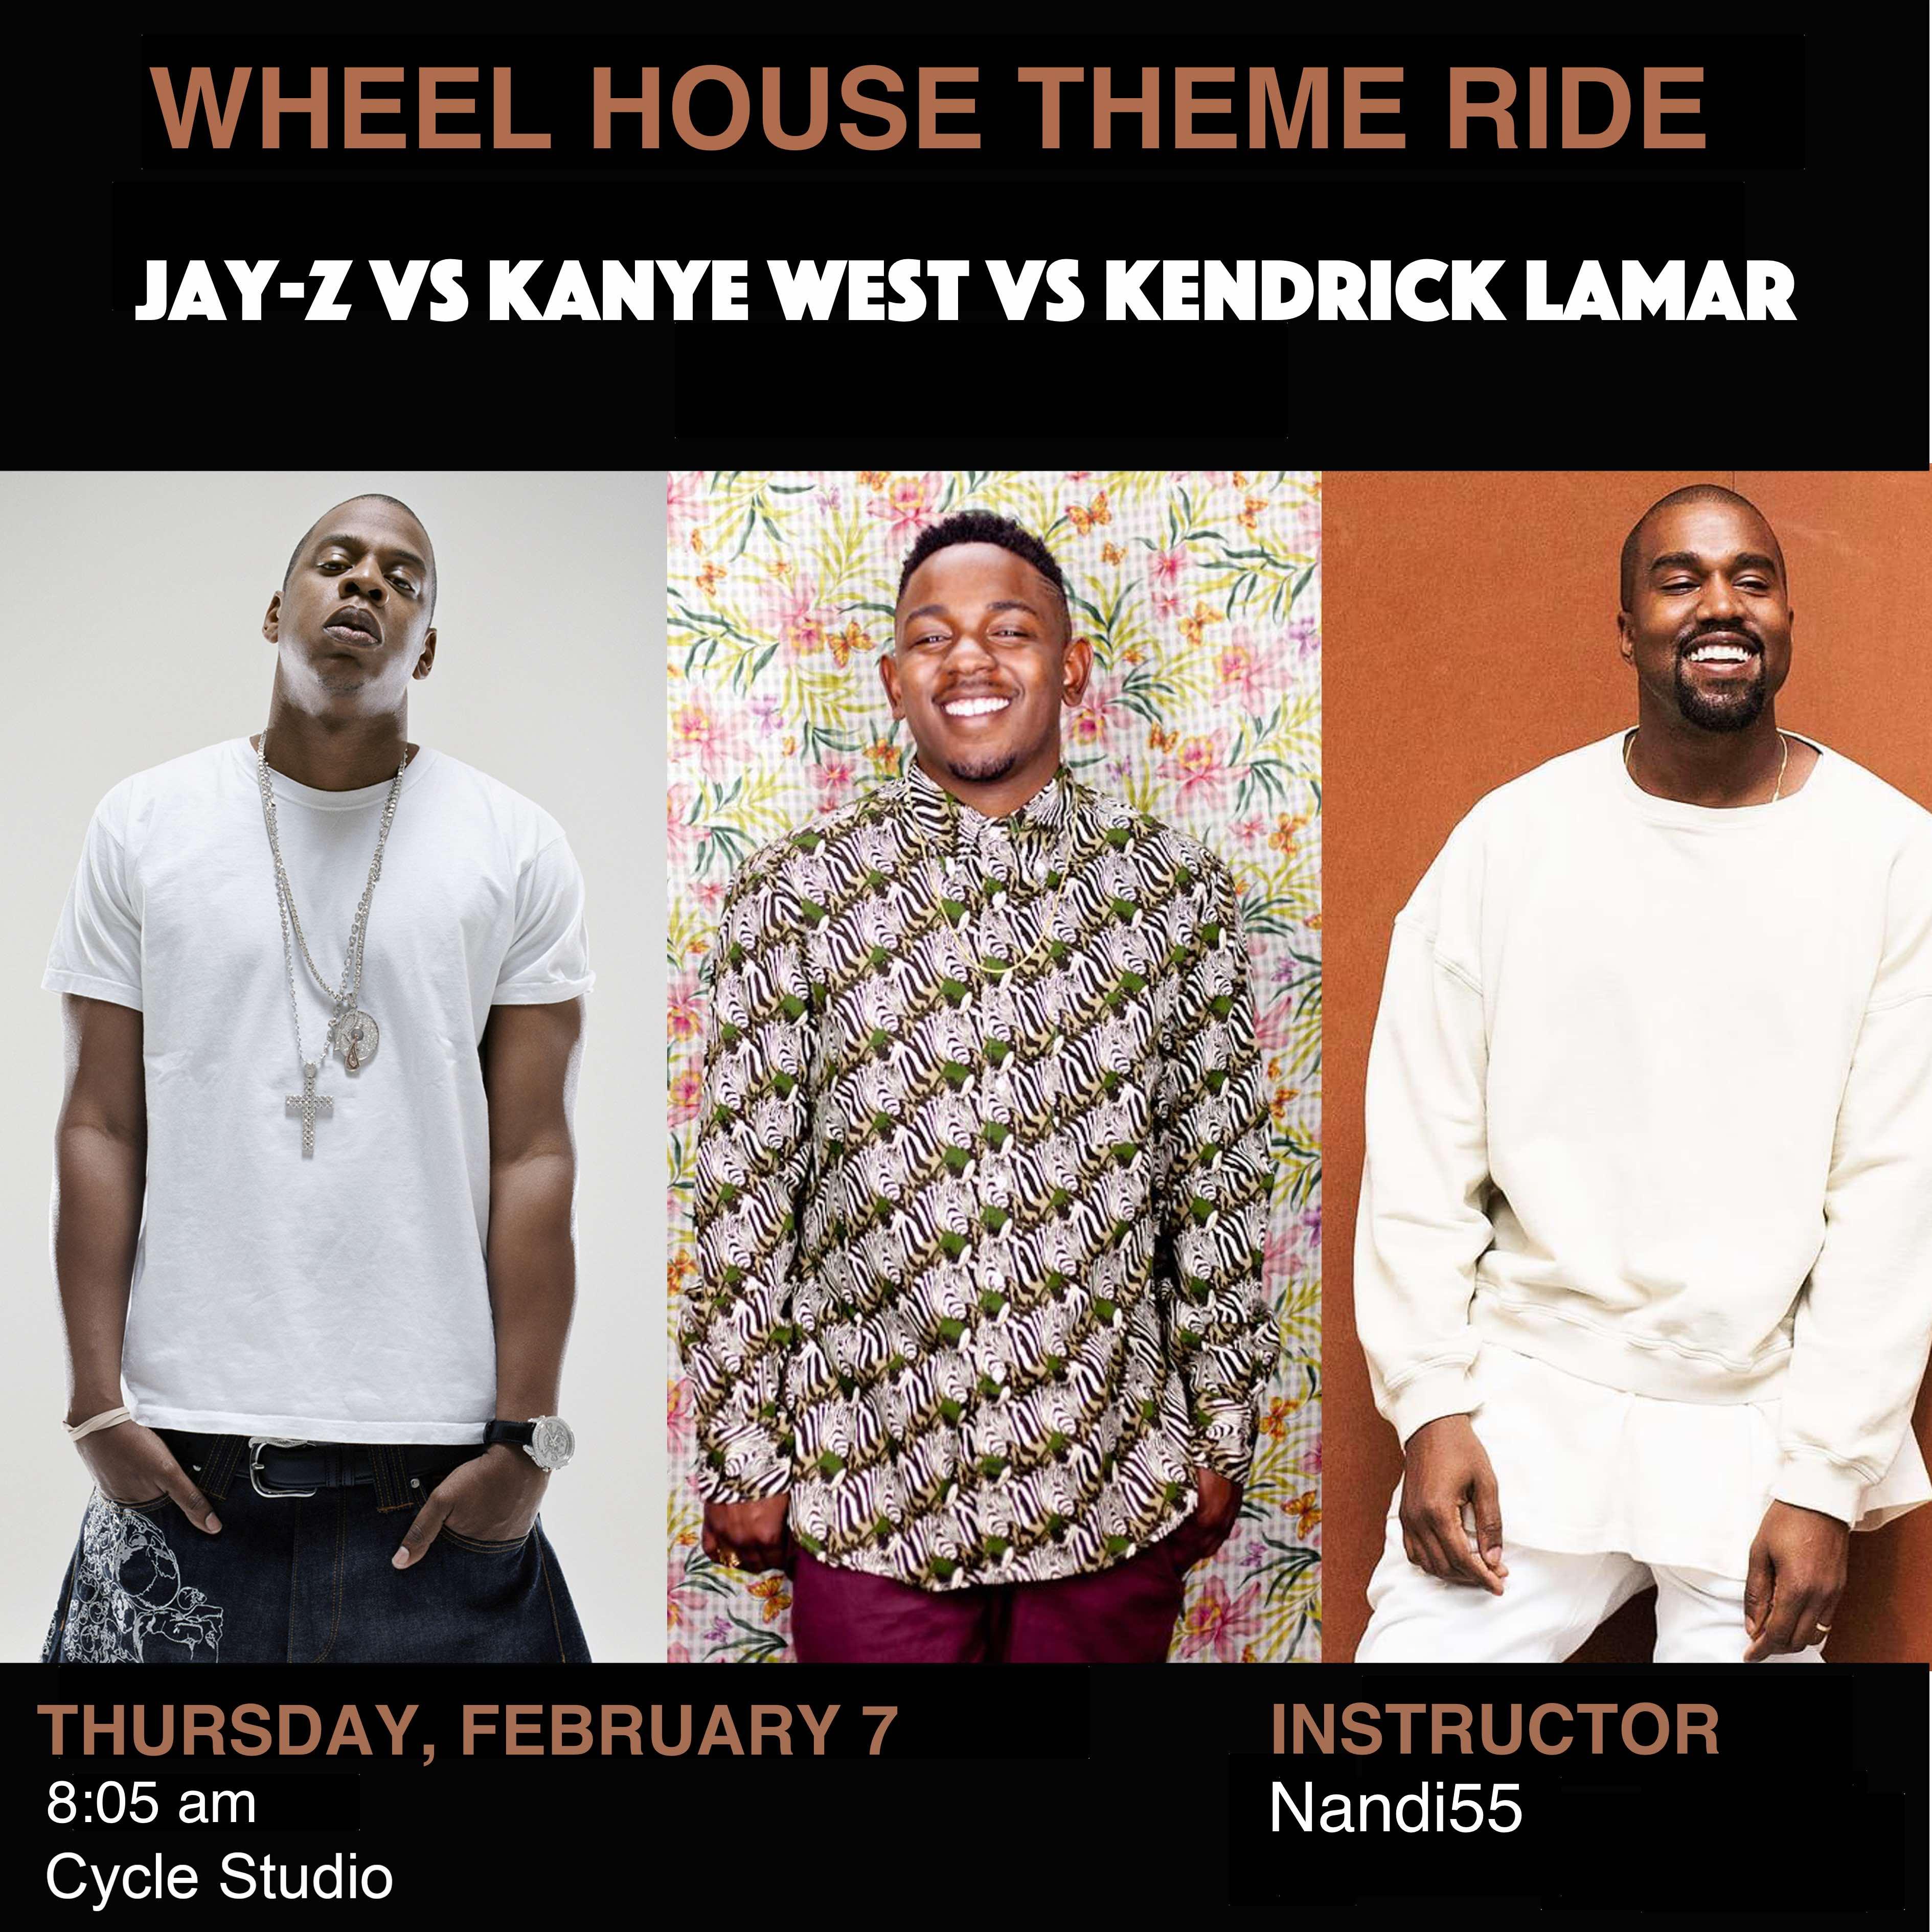 Jay-Z Vs Kanye West Vs Kendrick Lamar